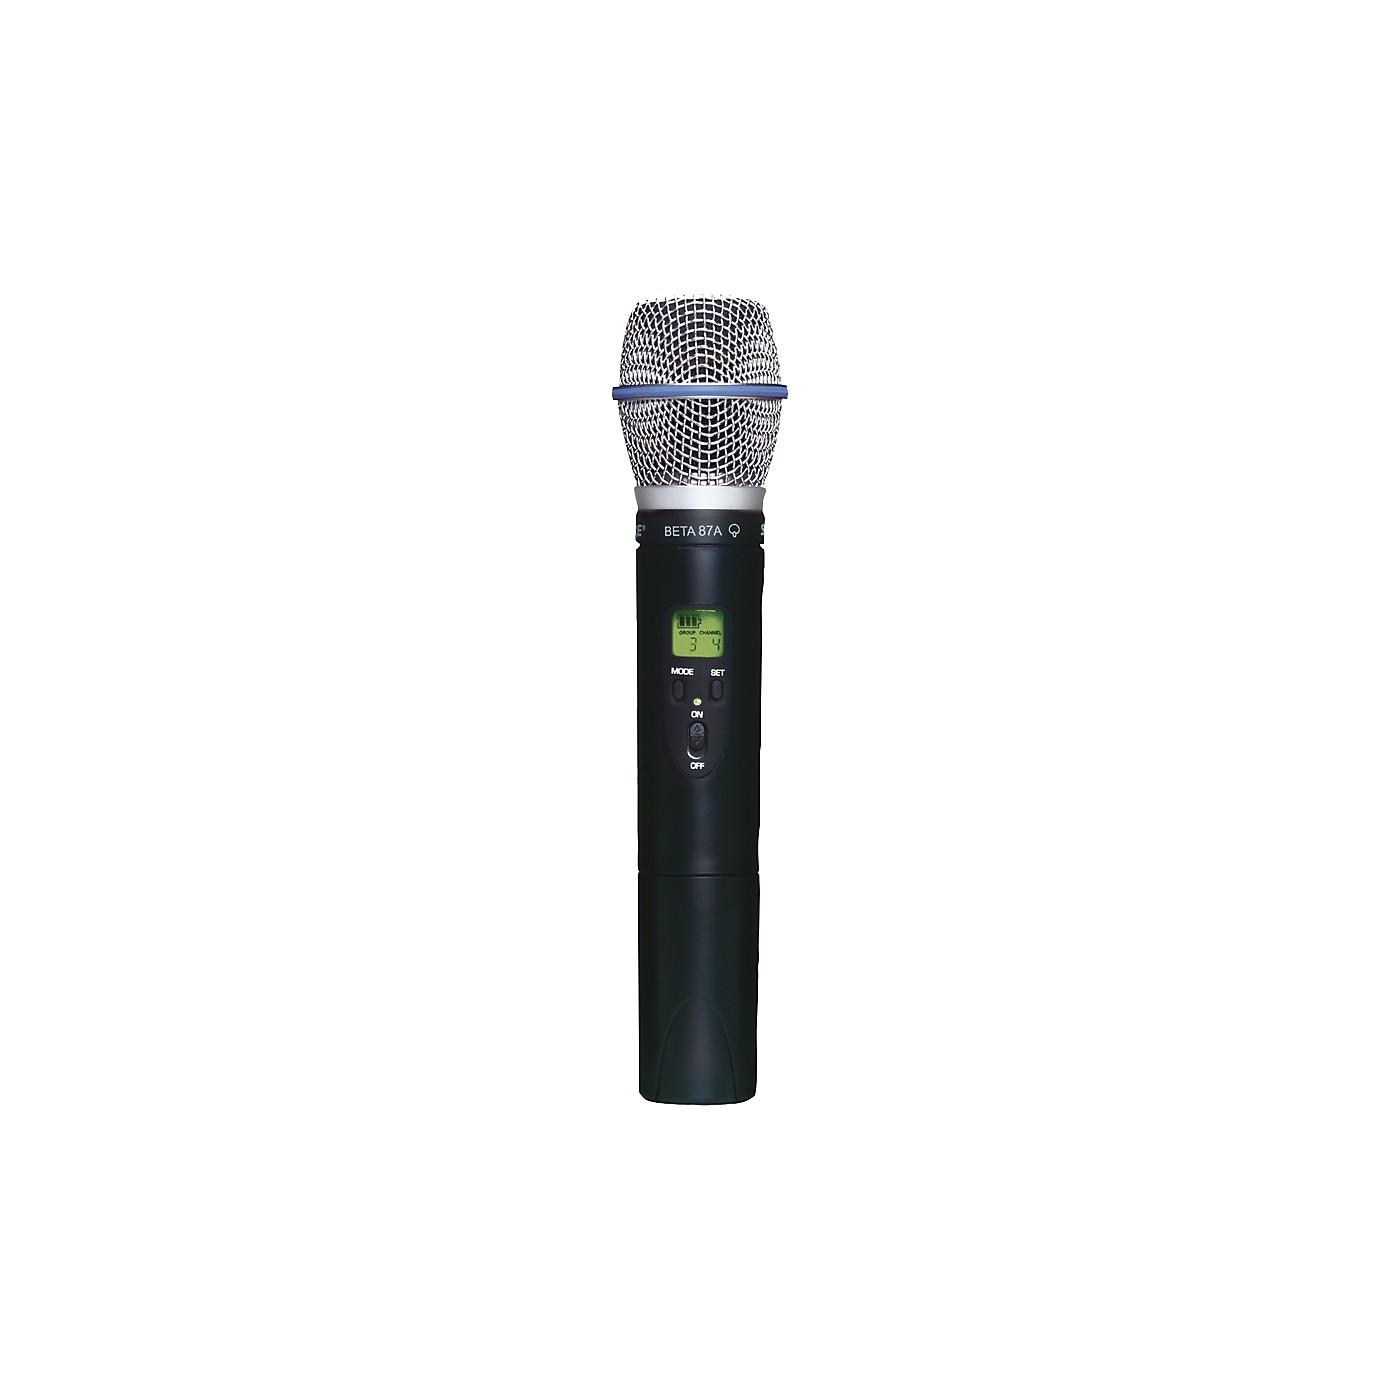 Shure SLX2/BETA87A Wireless Handheld Transmitter Microphone thumbnail